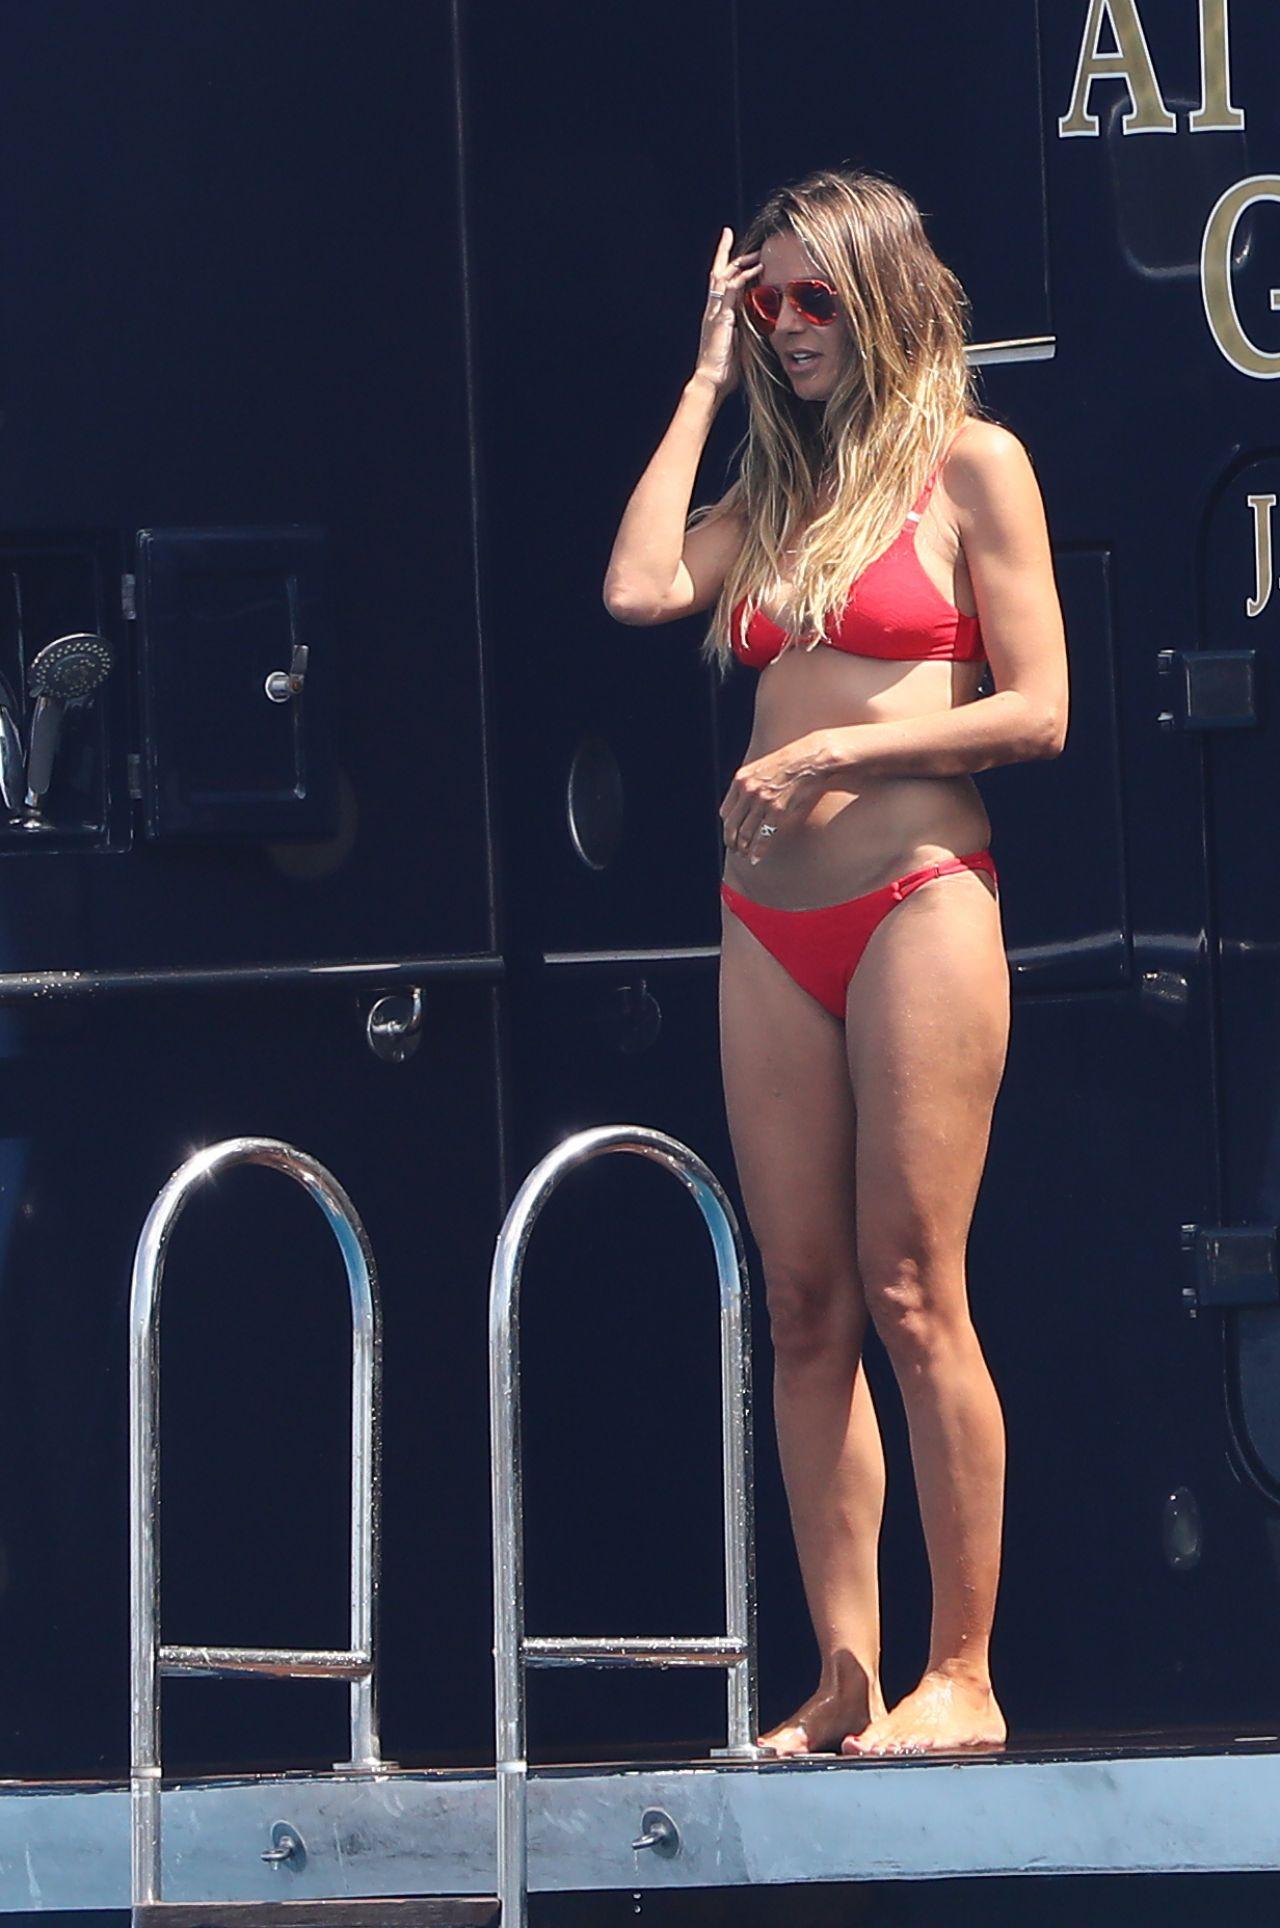 Heidi Klum In A Red Bikini On A Yacht Saint Tropez